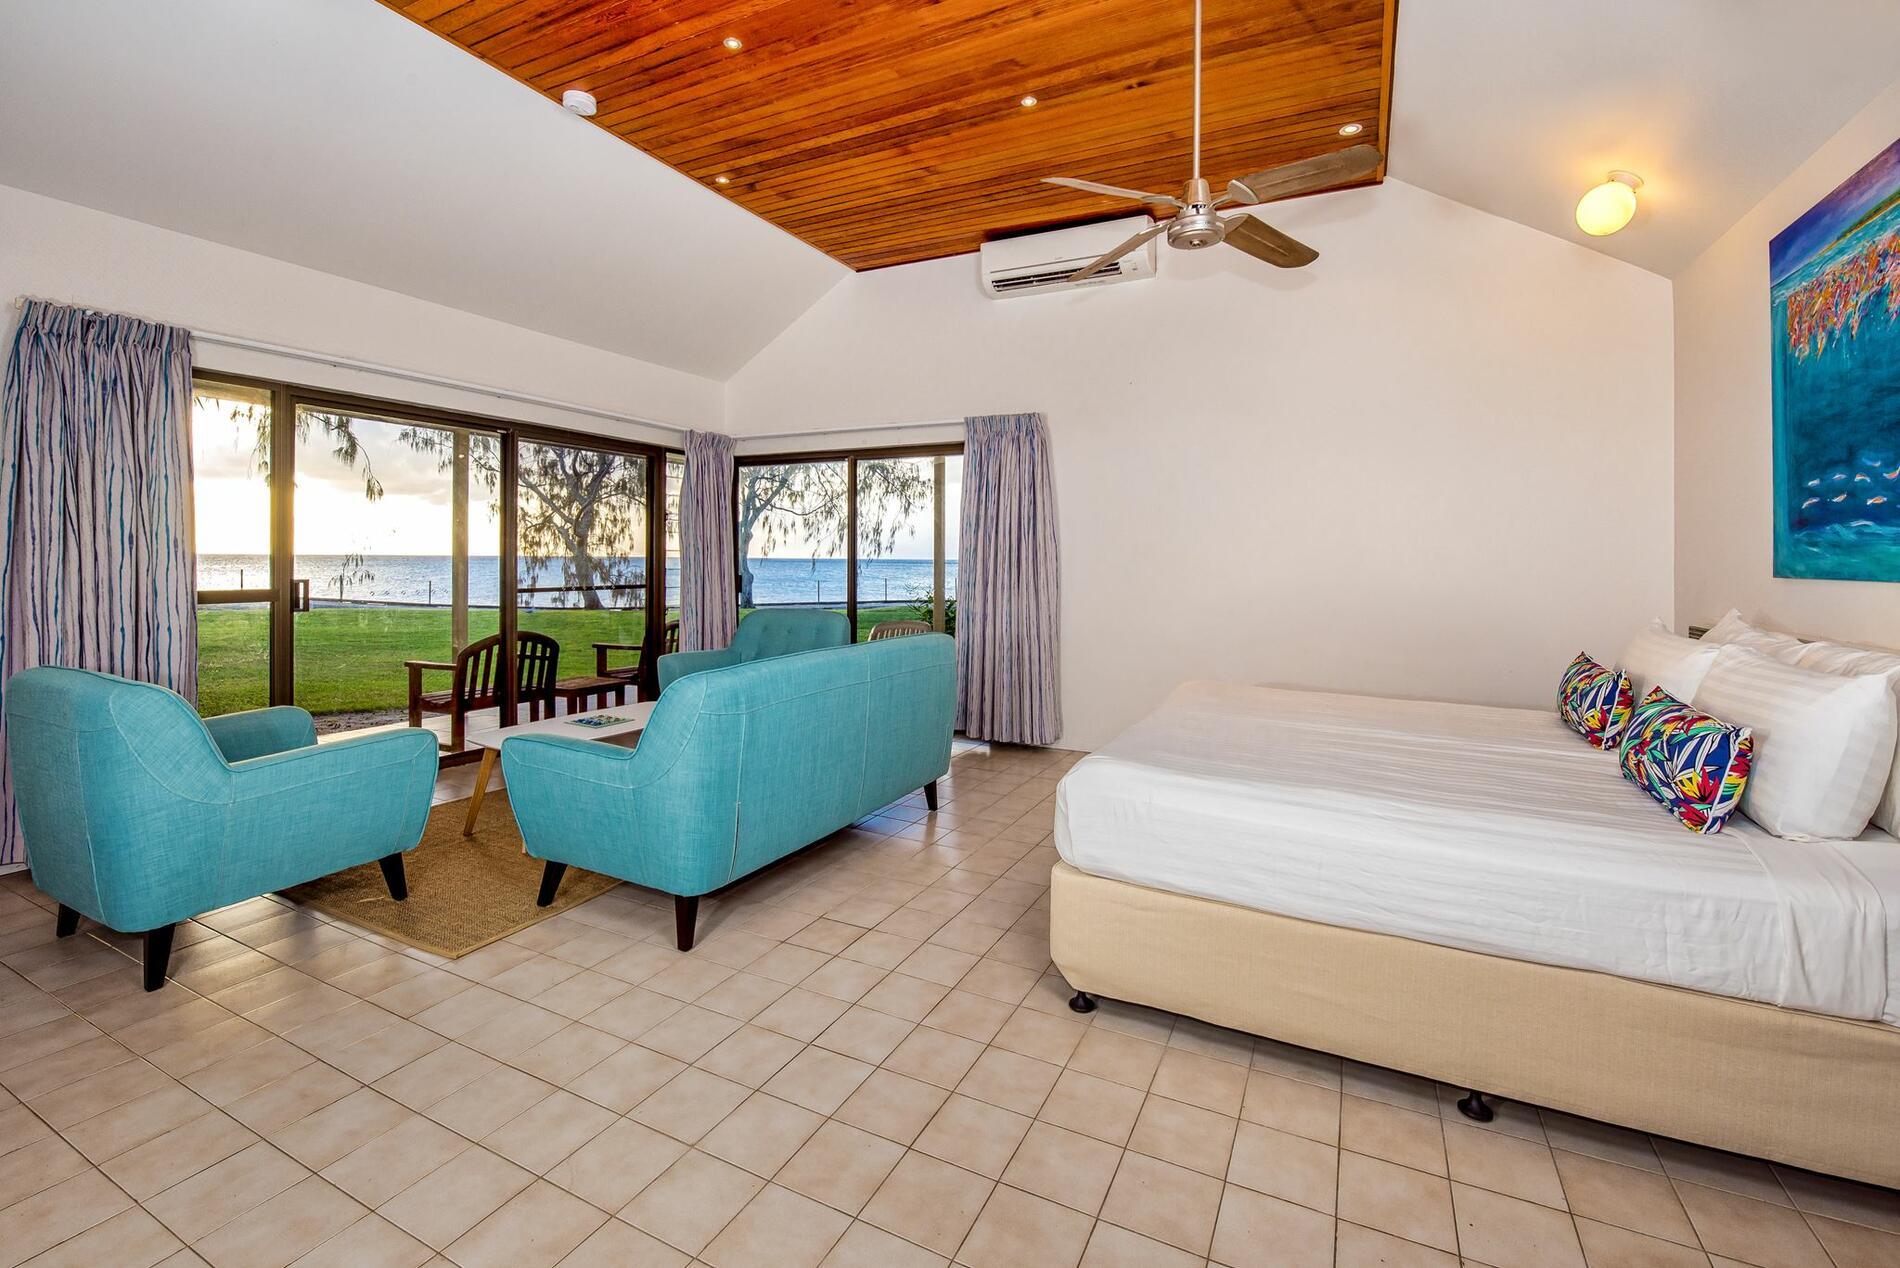 Point Suite - Heron Island Resort